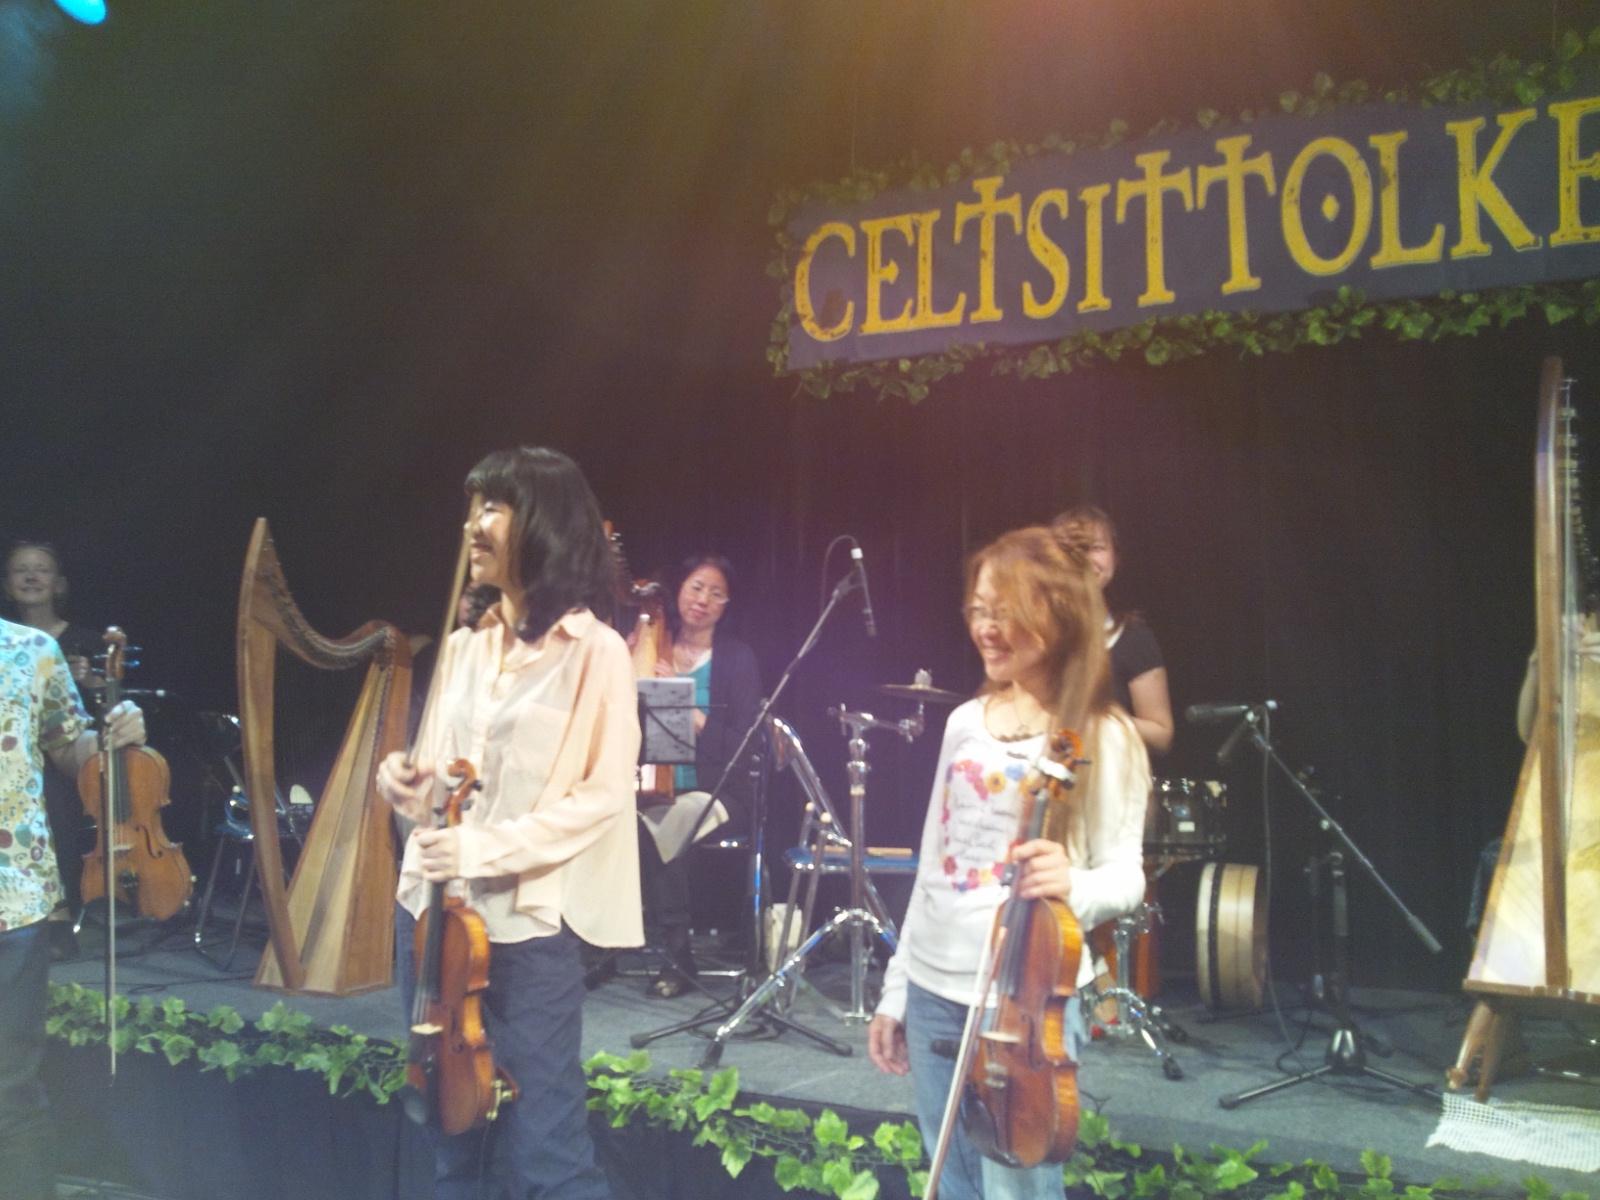 CELTSITTOLKE Vol.3 レコ発ライブ 少し参加させていただきました(^_-)